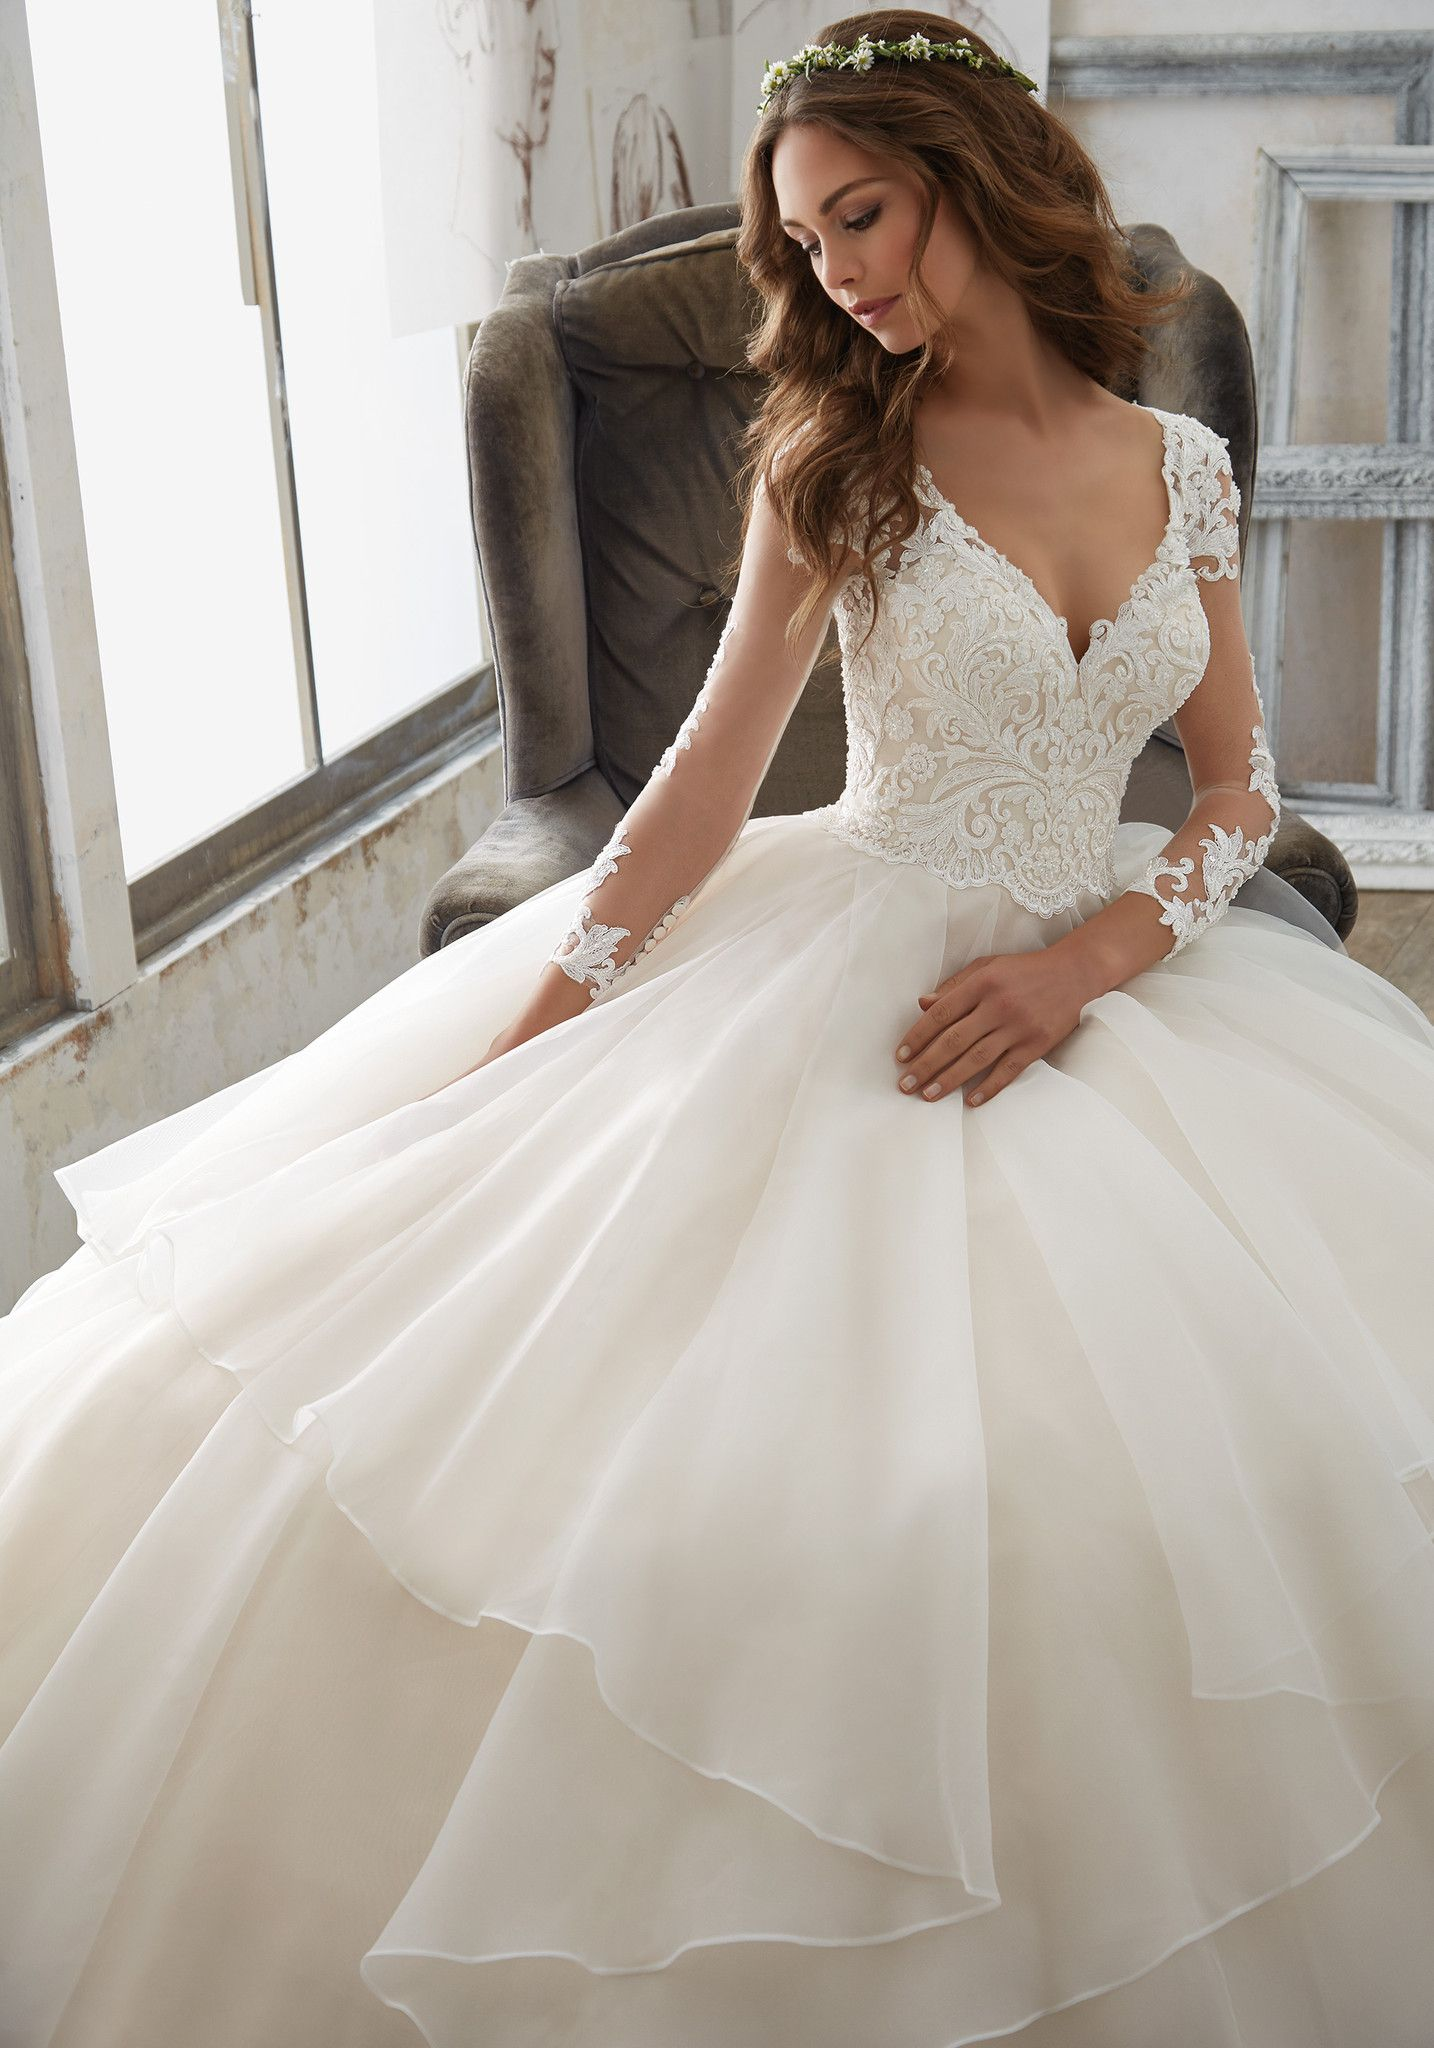 Blu - Maya - 5517 - All Dressed Up, Bridal Gown | Tuxedo rental ...